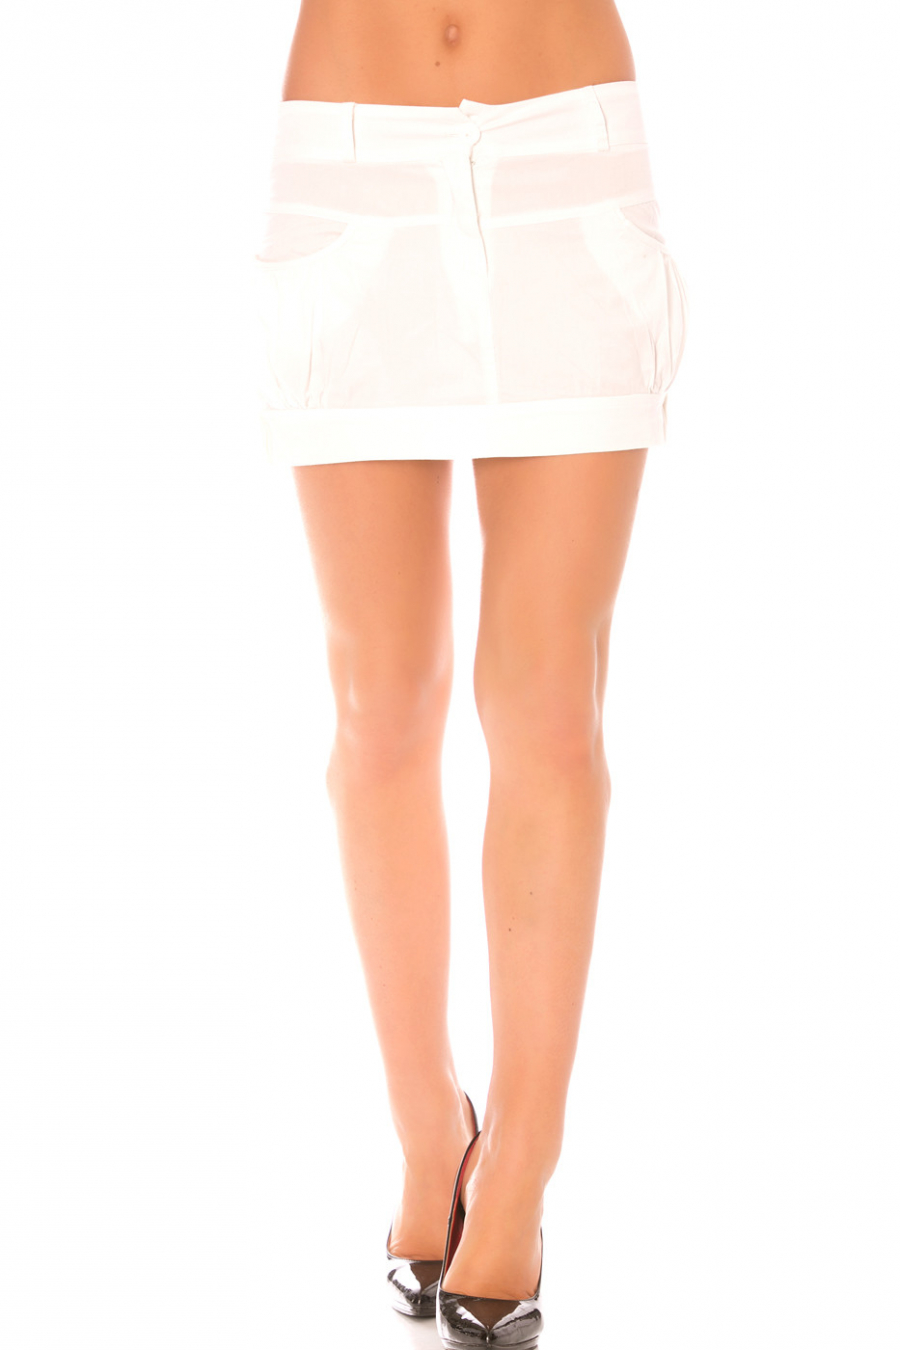 Jupe Blanche courte à poches. Jupe